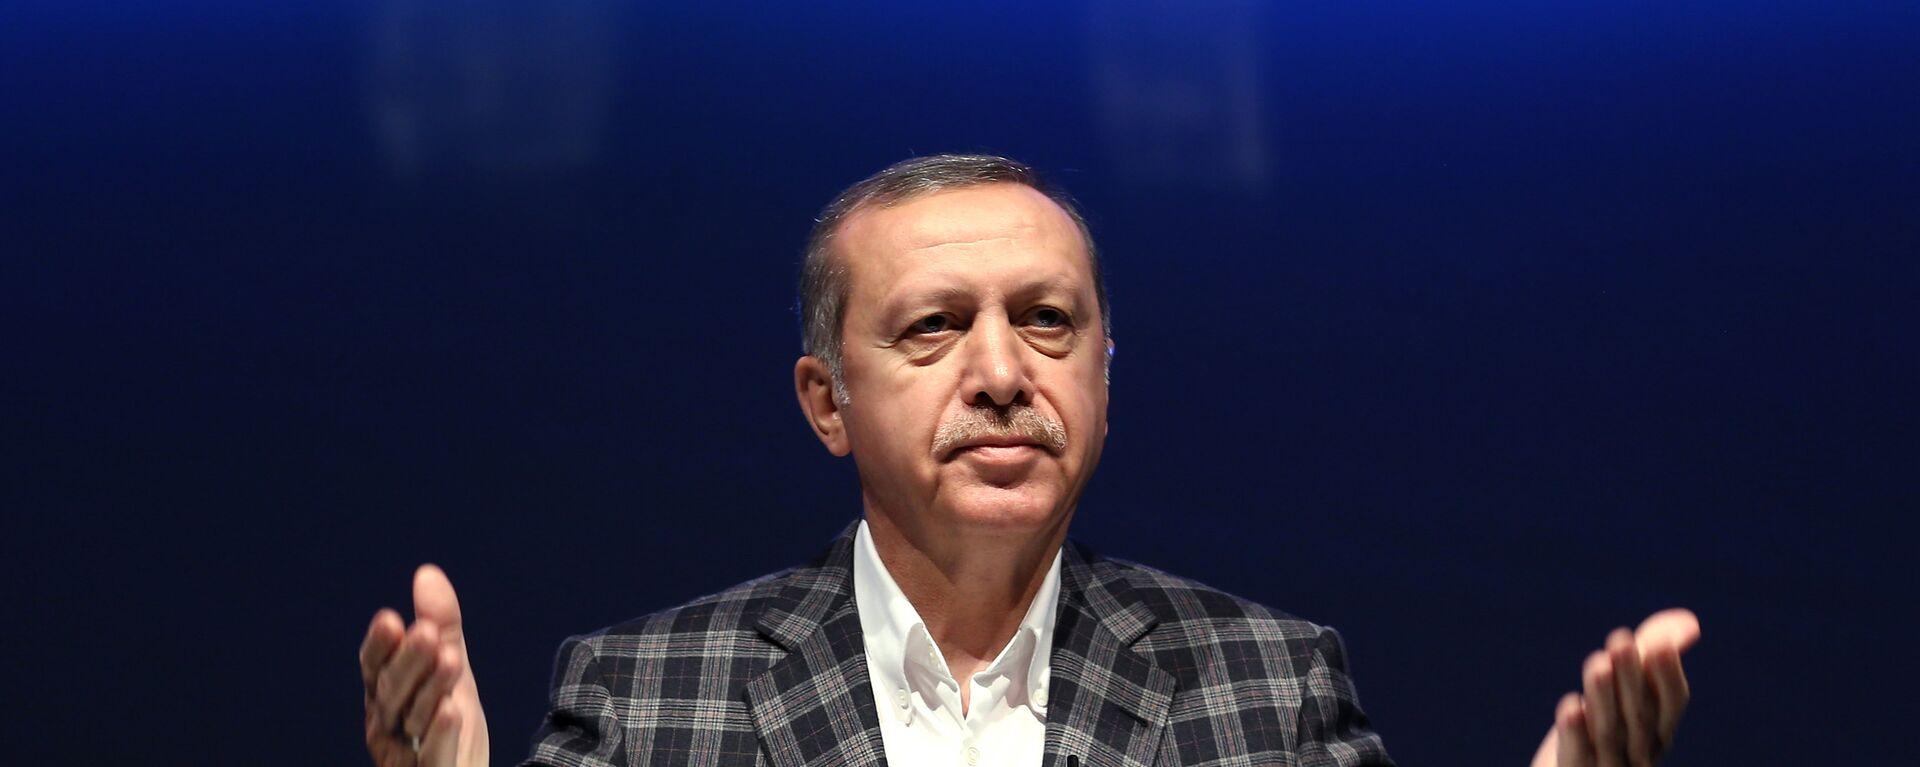 Turkey's President Recep Tayyip Erdogan speaks during a meeting on work security, in Istanbul, Sunday, May 8, 2016.  - Sputnik Mundo, 1920, 05.04.2021